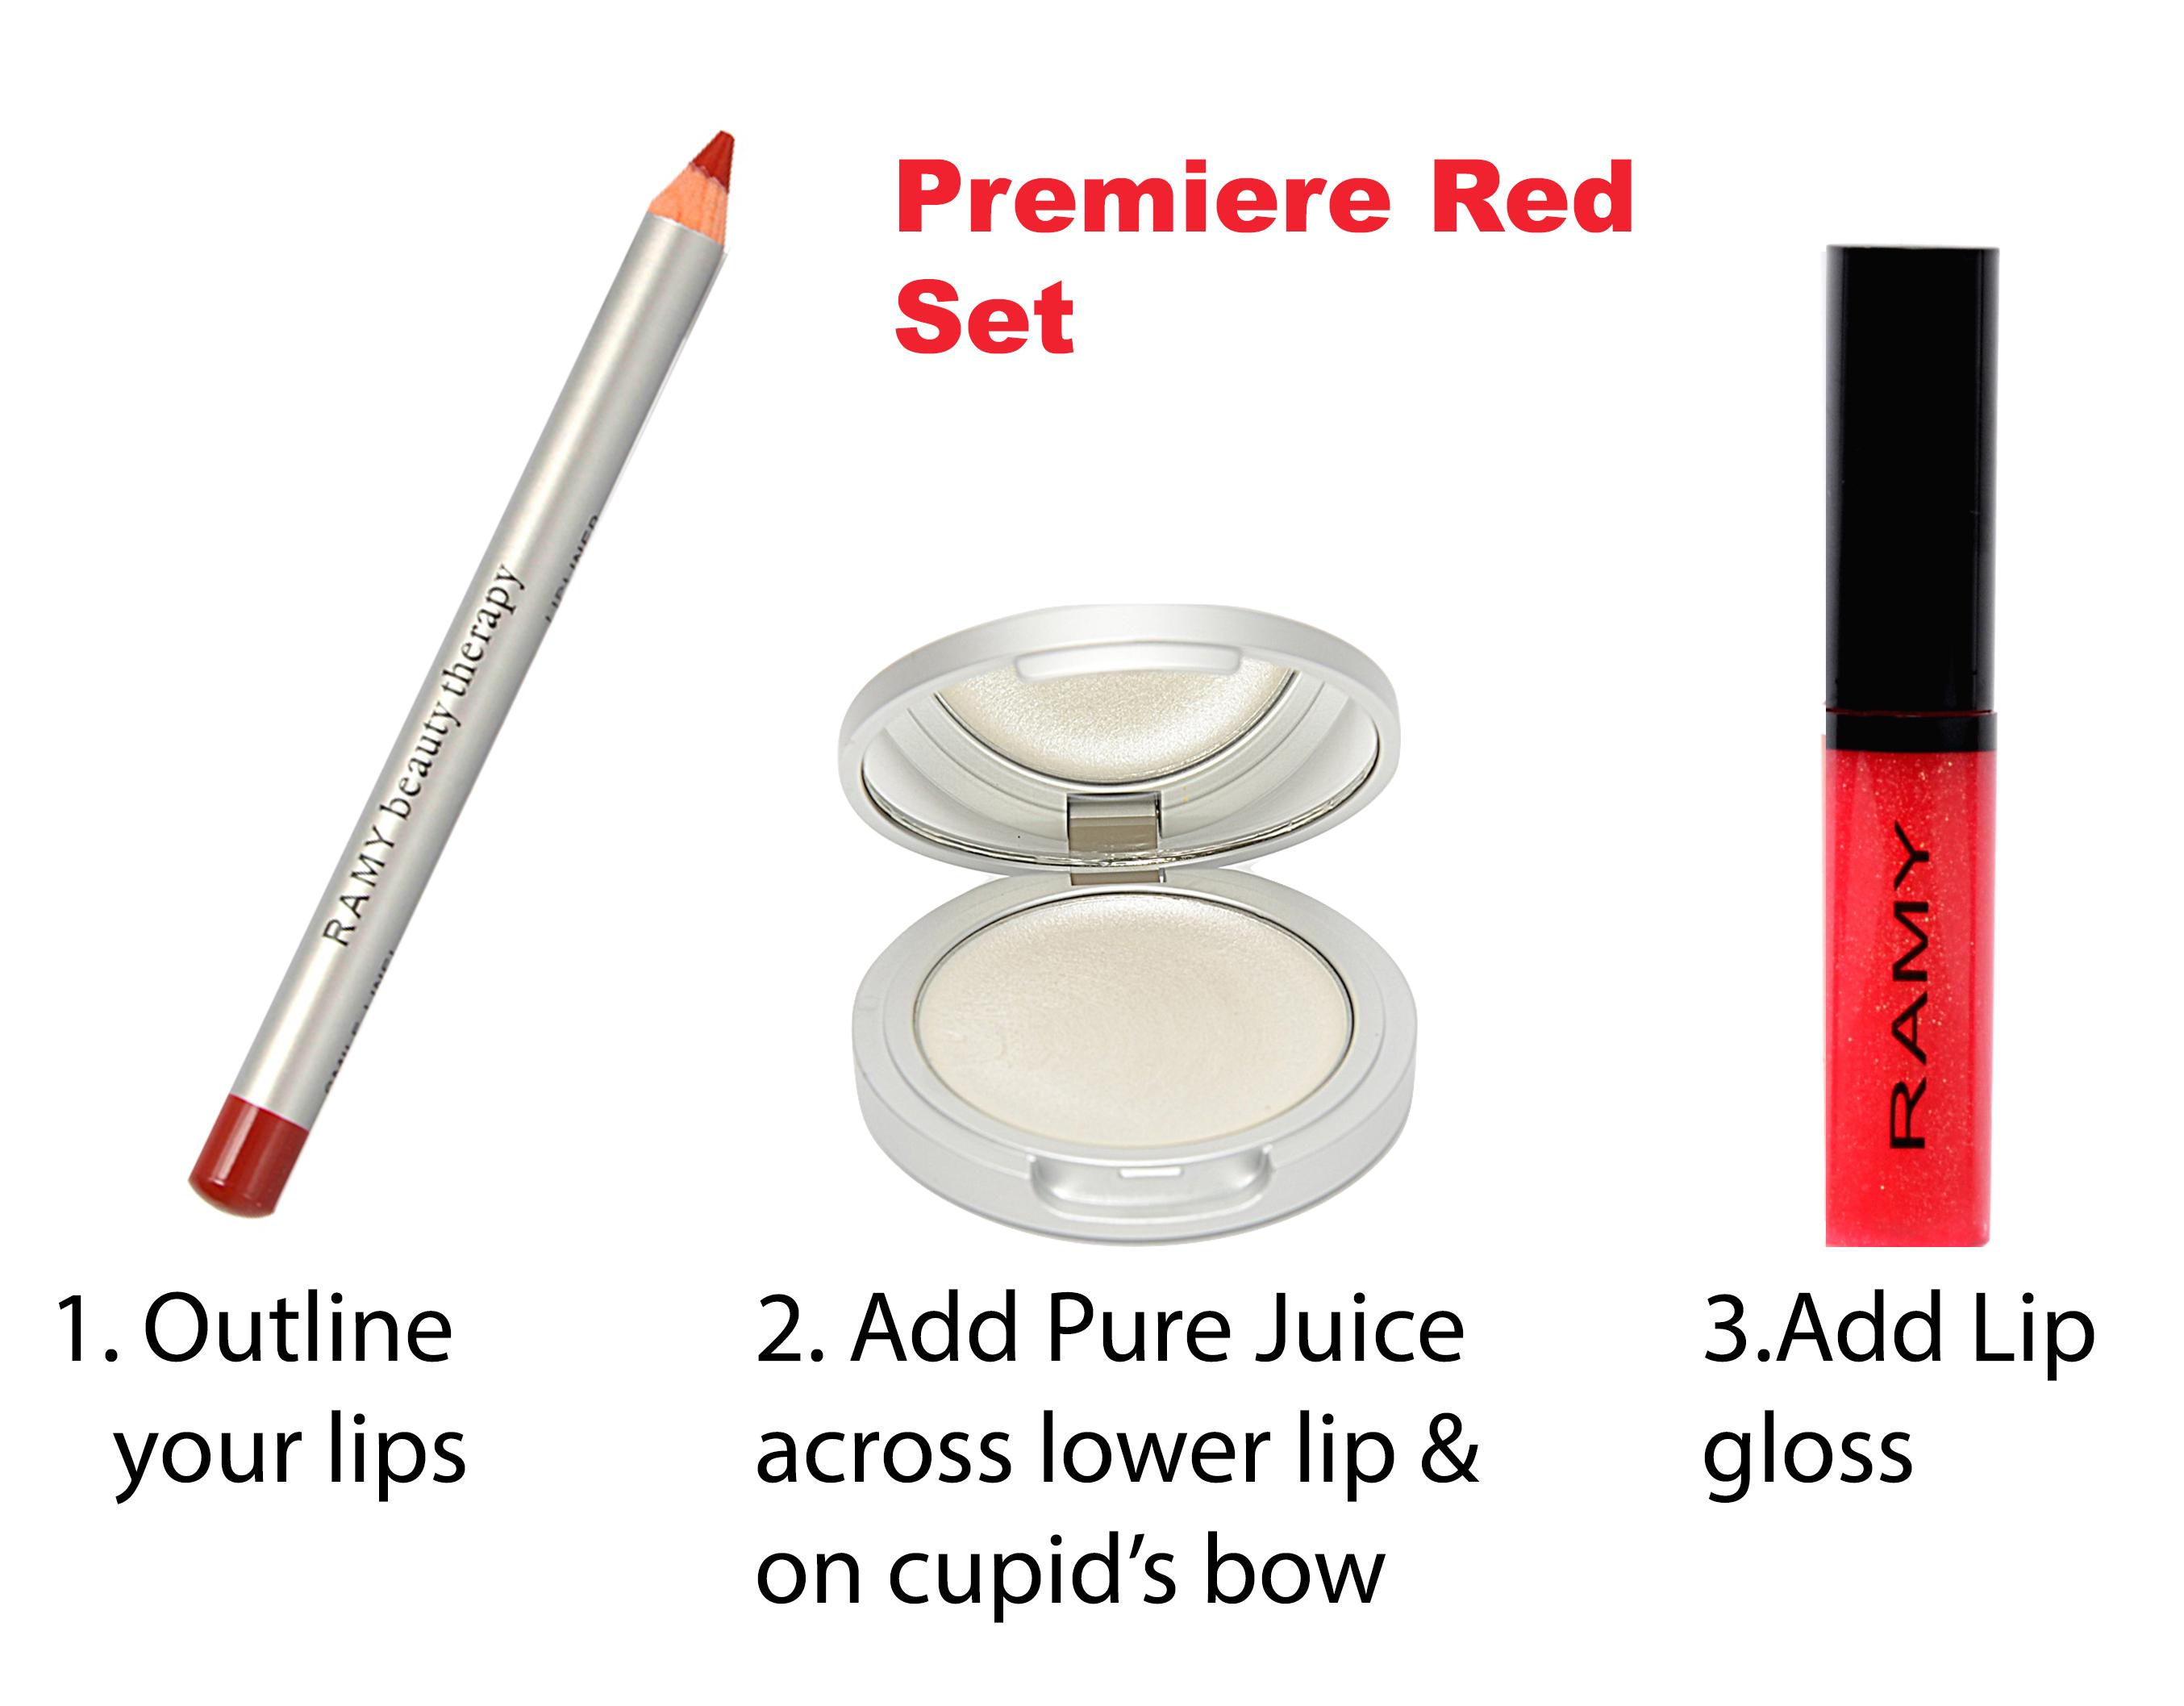 kylie-who-lip-kit-premiere-red2.jpg